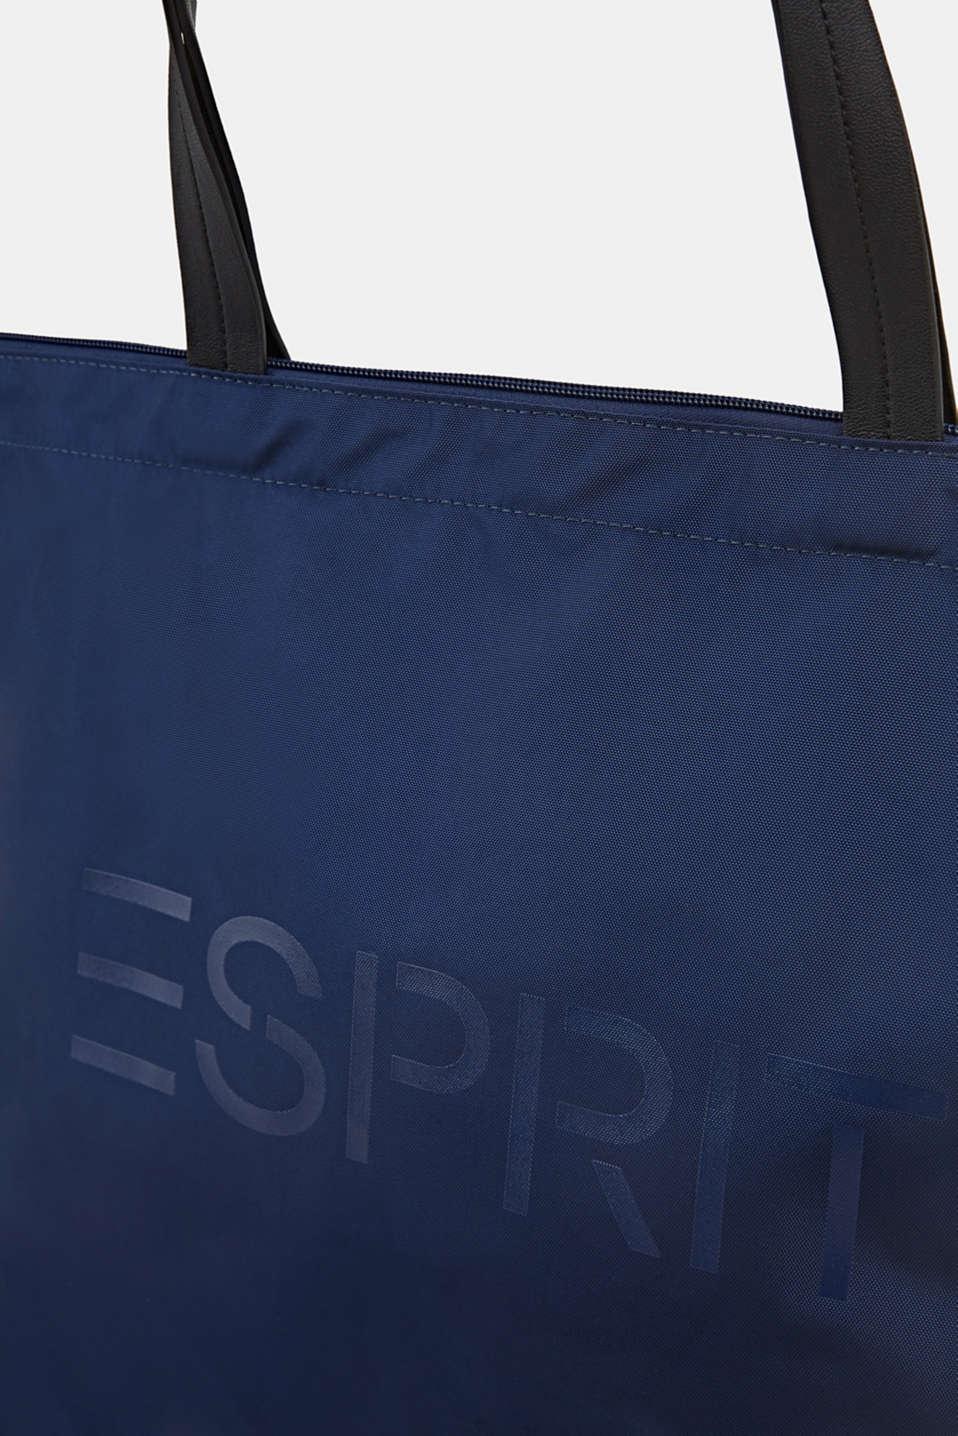 Nylon tote bag, NAVY, detail image number 3